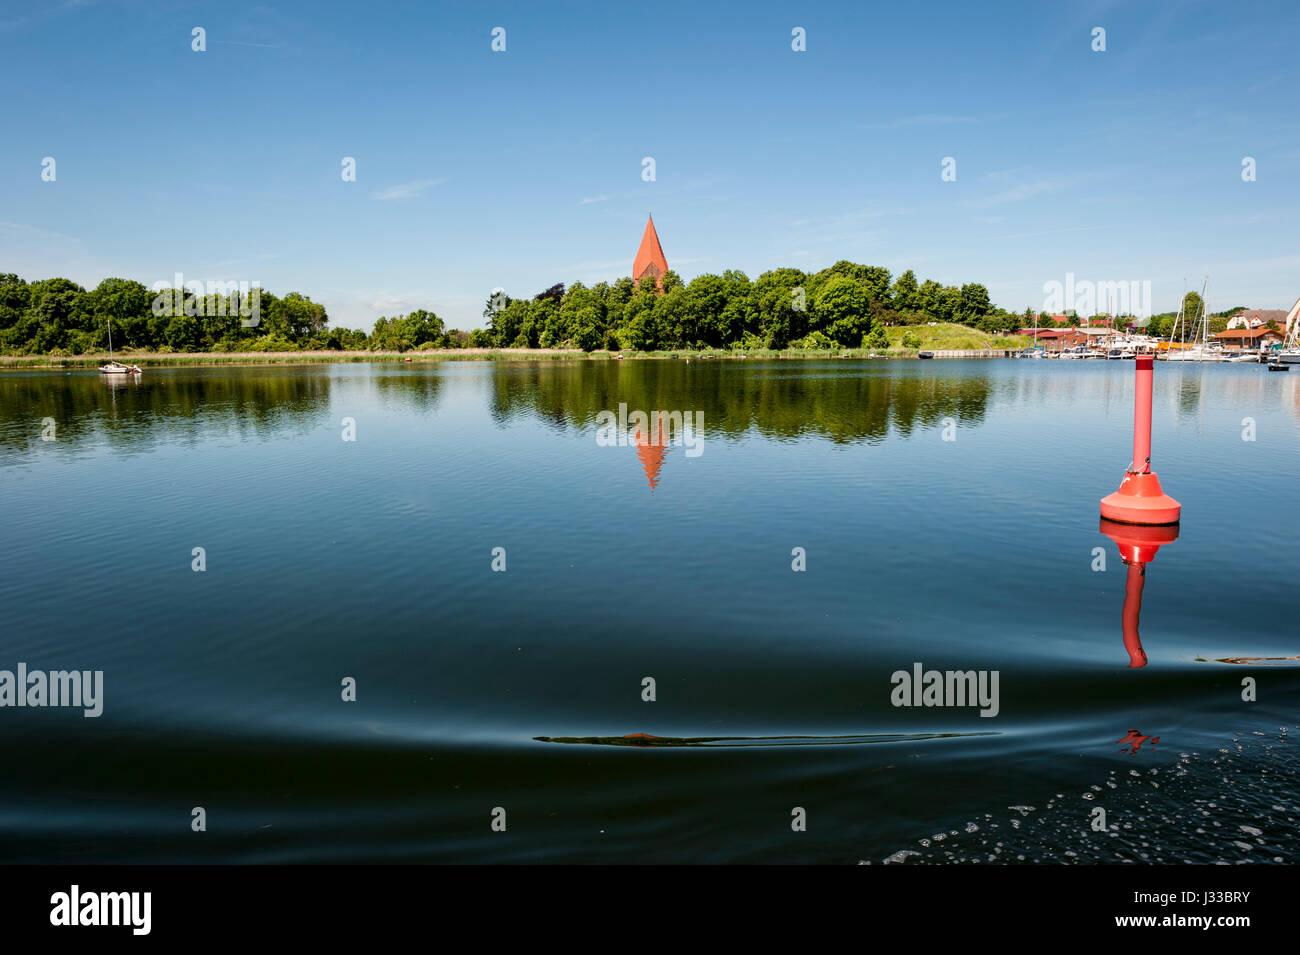 Sea near Poel island, Wismar, Baltic Sea, Germany, Europe, summer - Stock Image